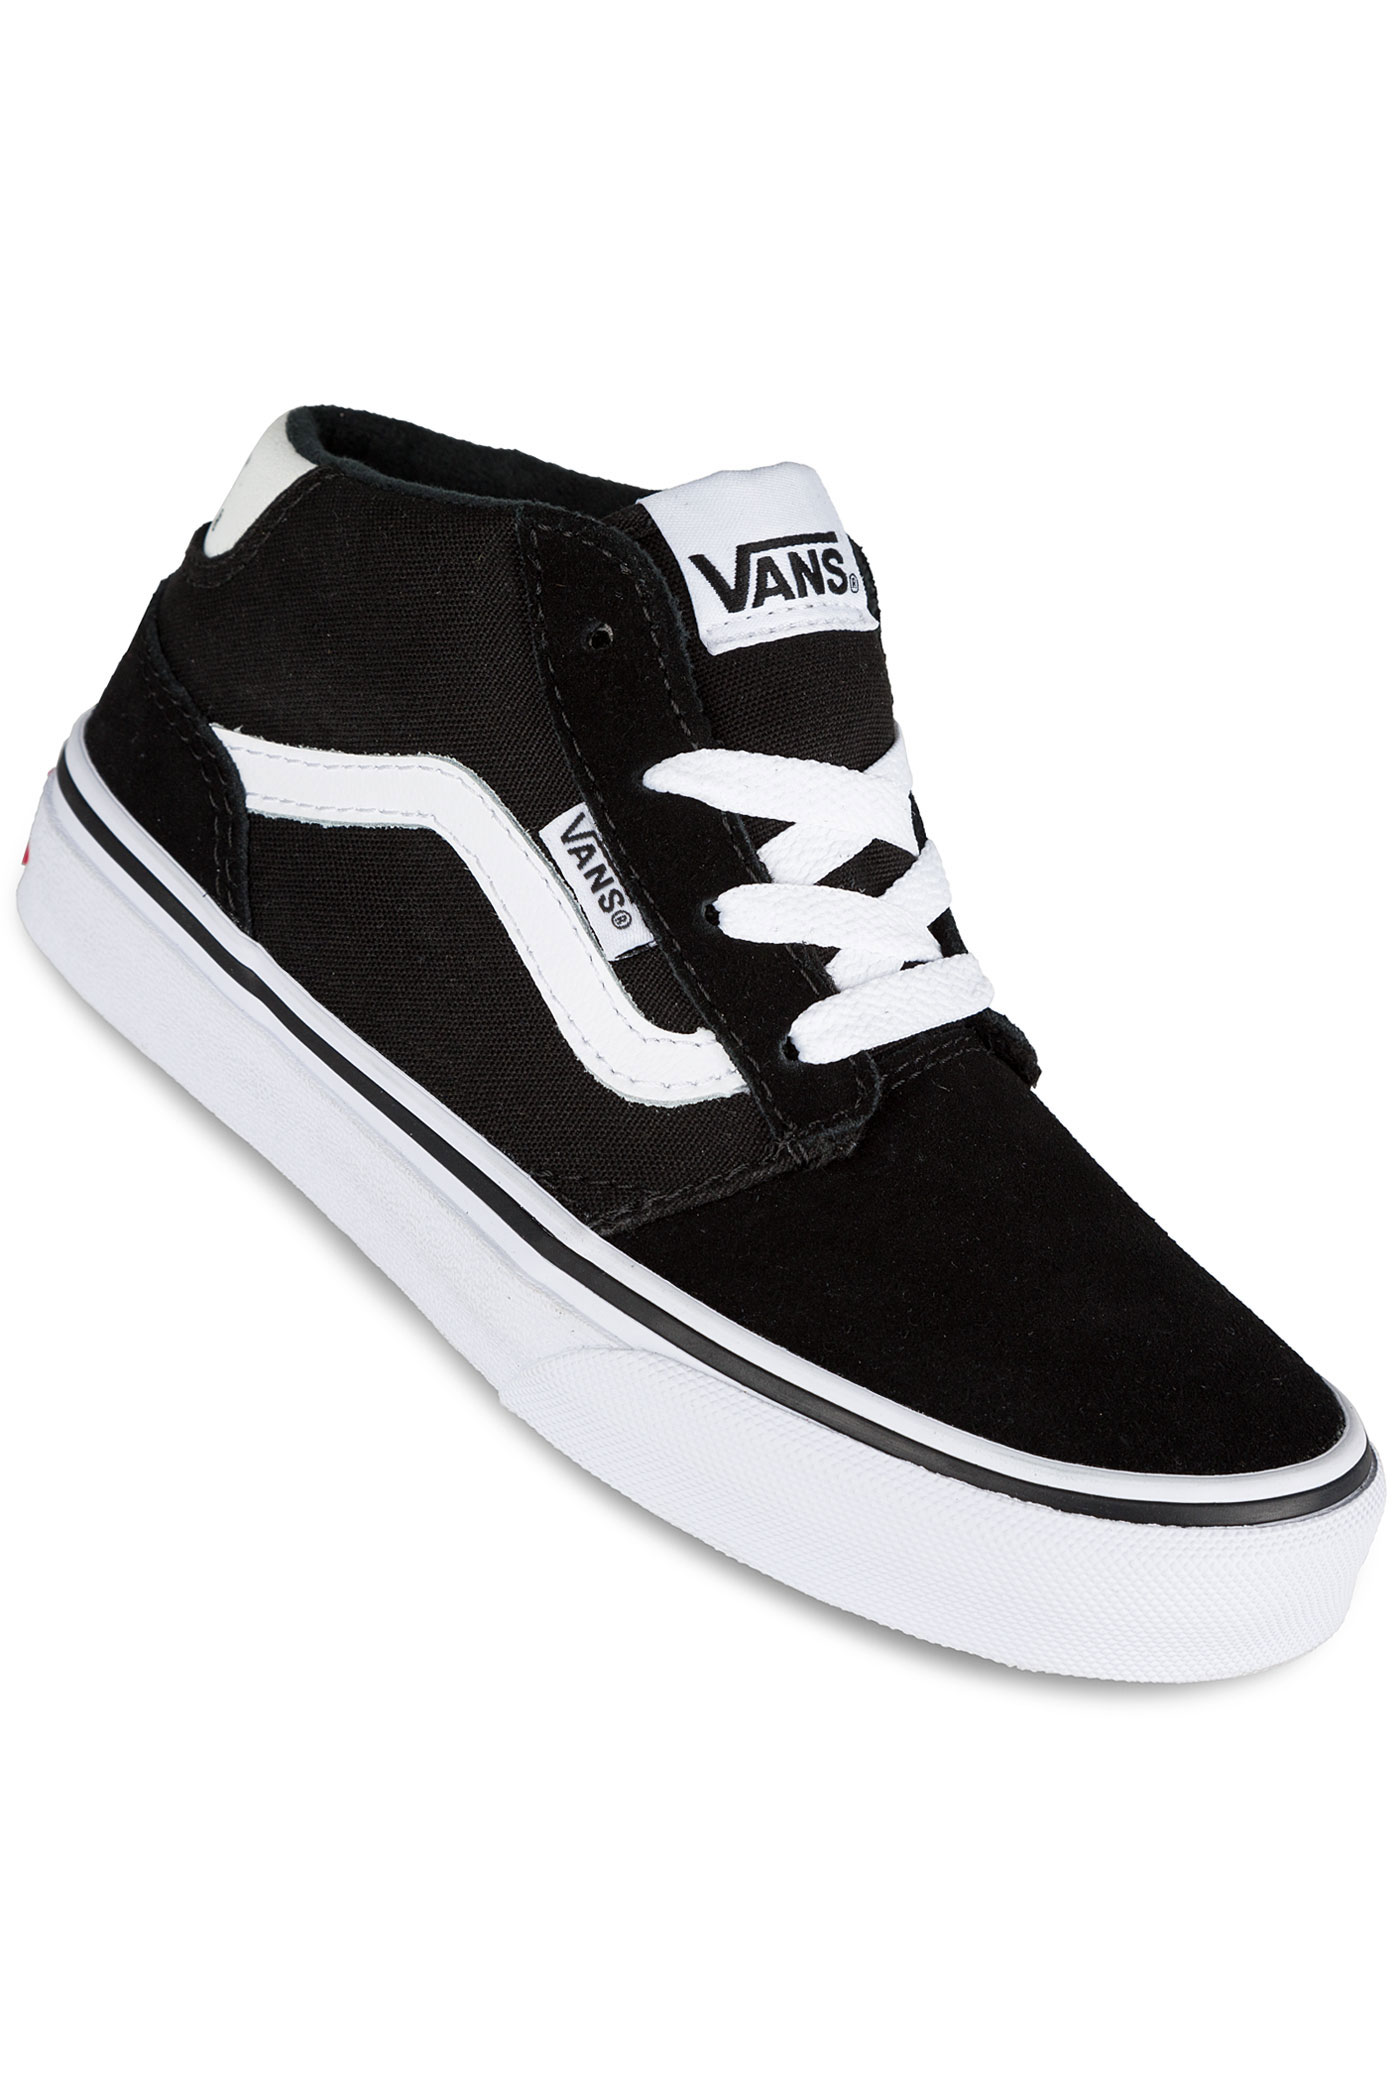 Vans Shoes Canada Customer Service